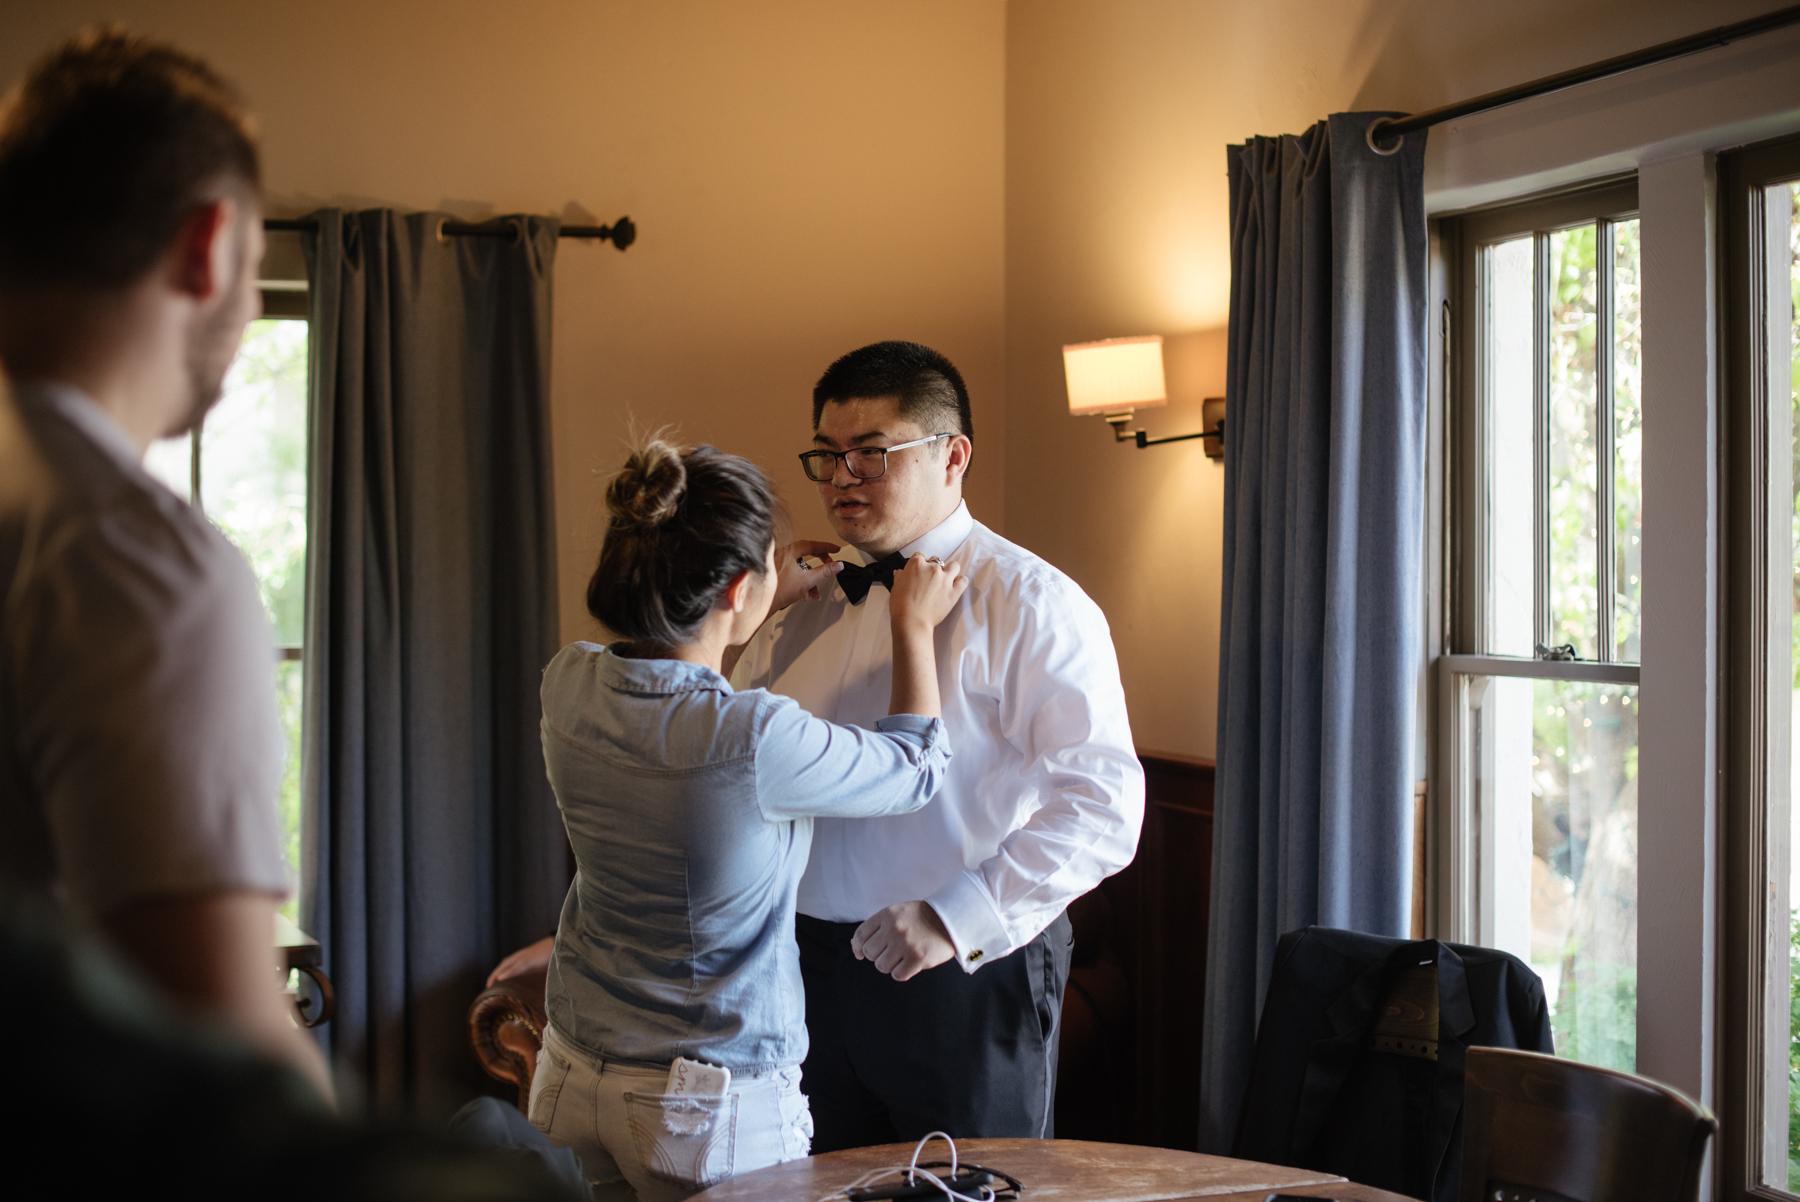 Secret Garden Event Center Wedding - Meredith Amadee Photography-20.jpg